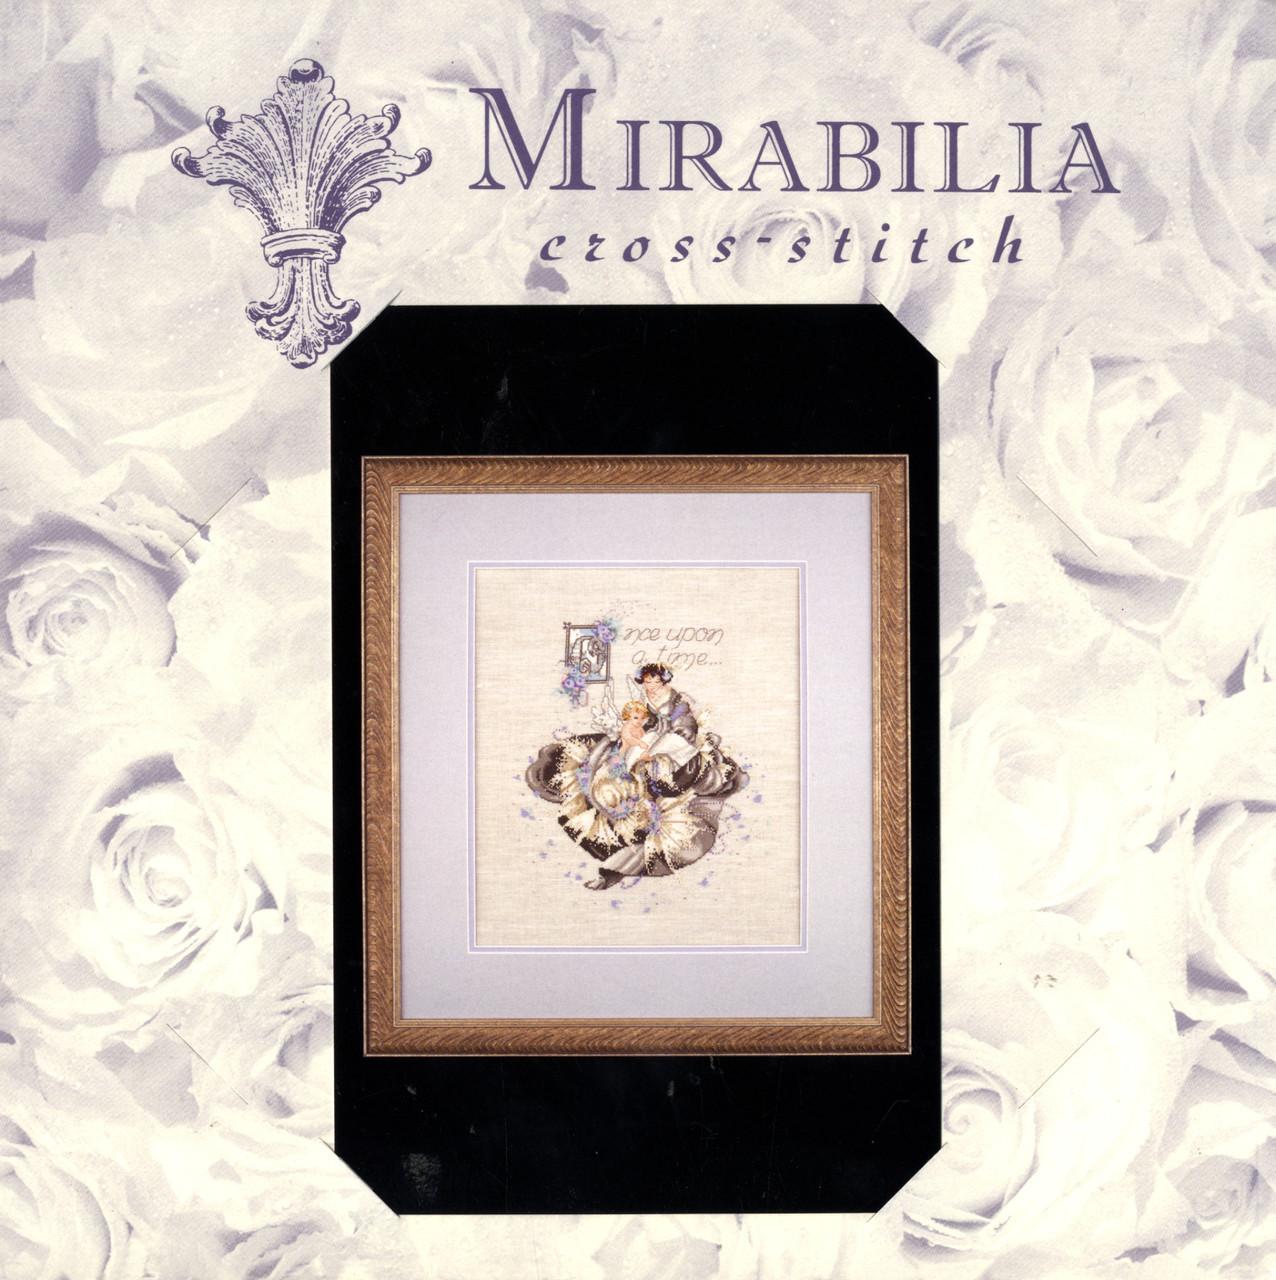 Mirabilia - Fairy Tales